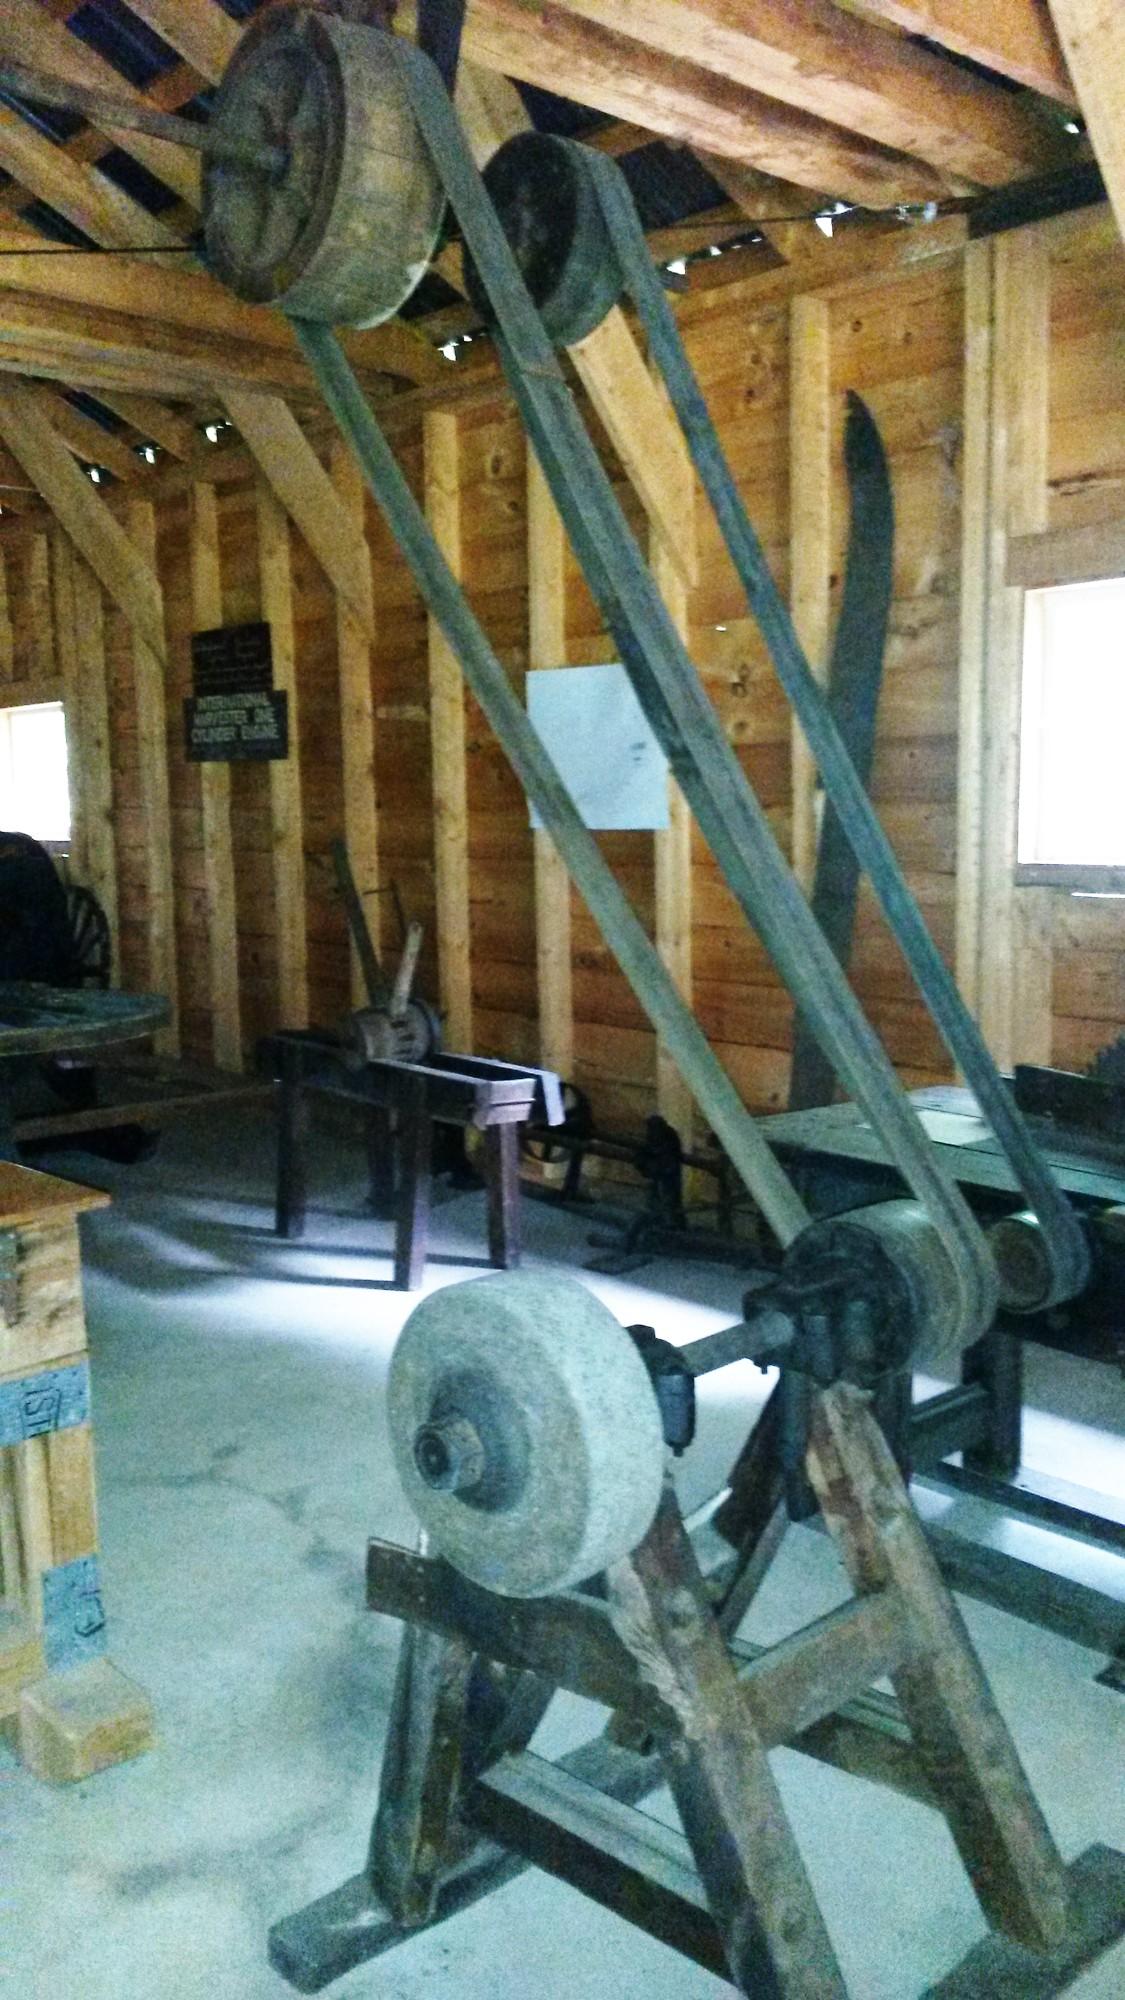 Belt-powered wheelwright workshop at Woodsmen's museum